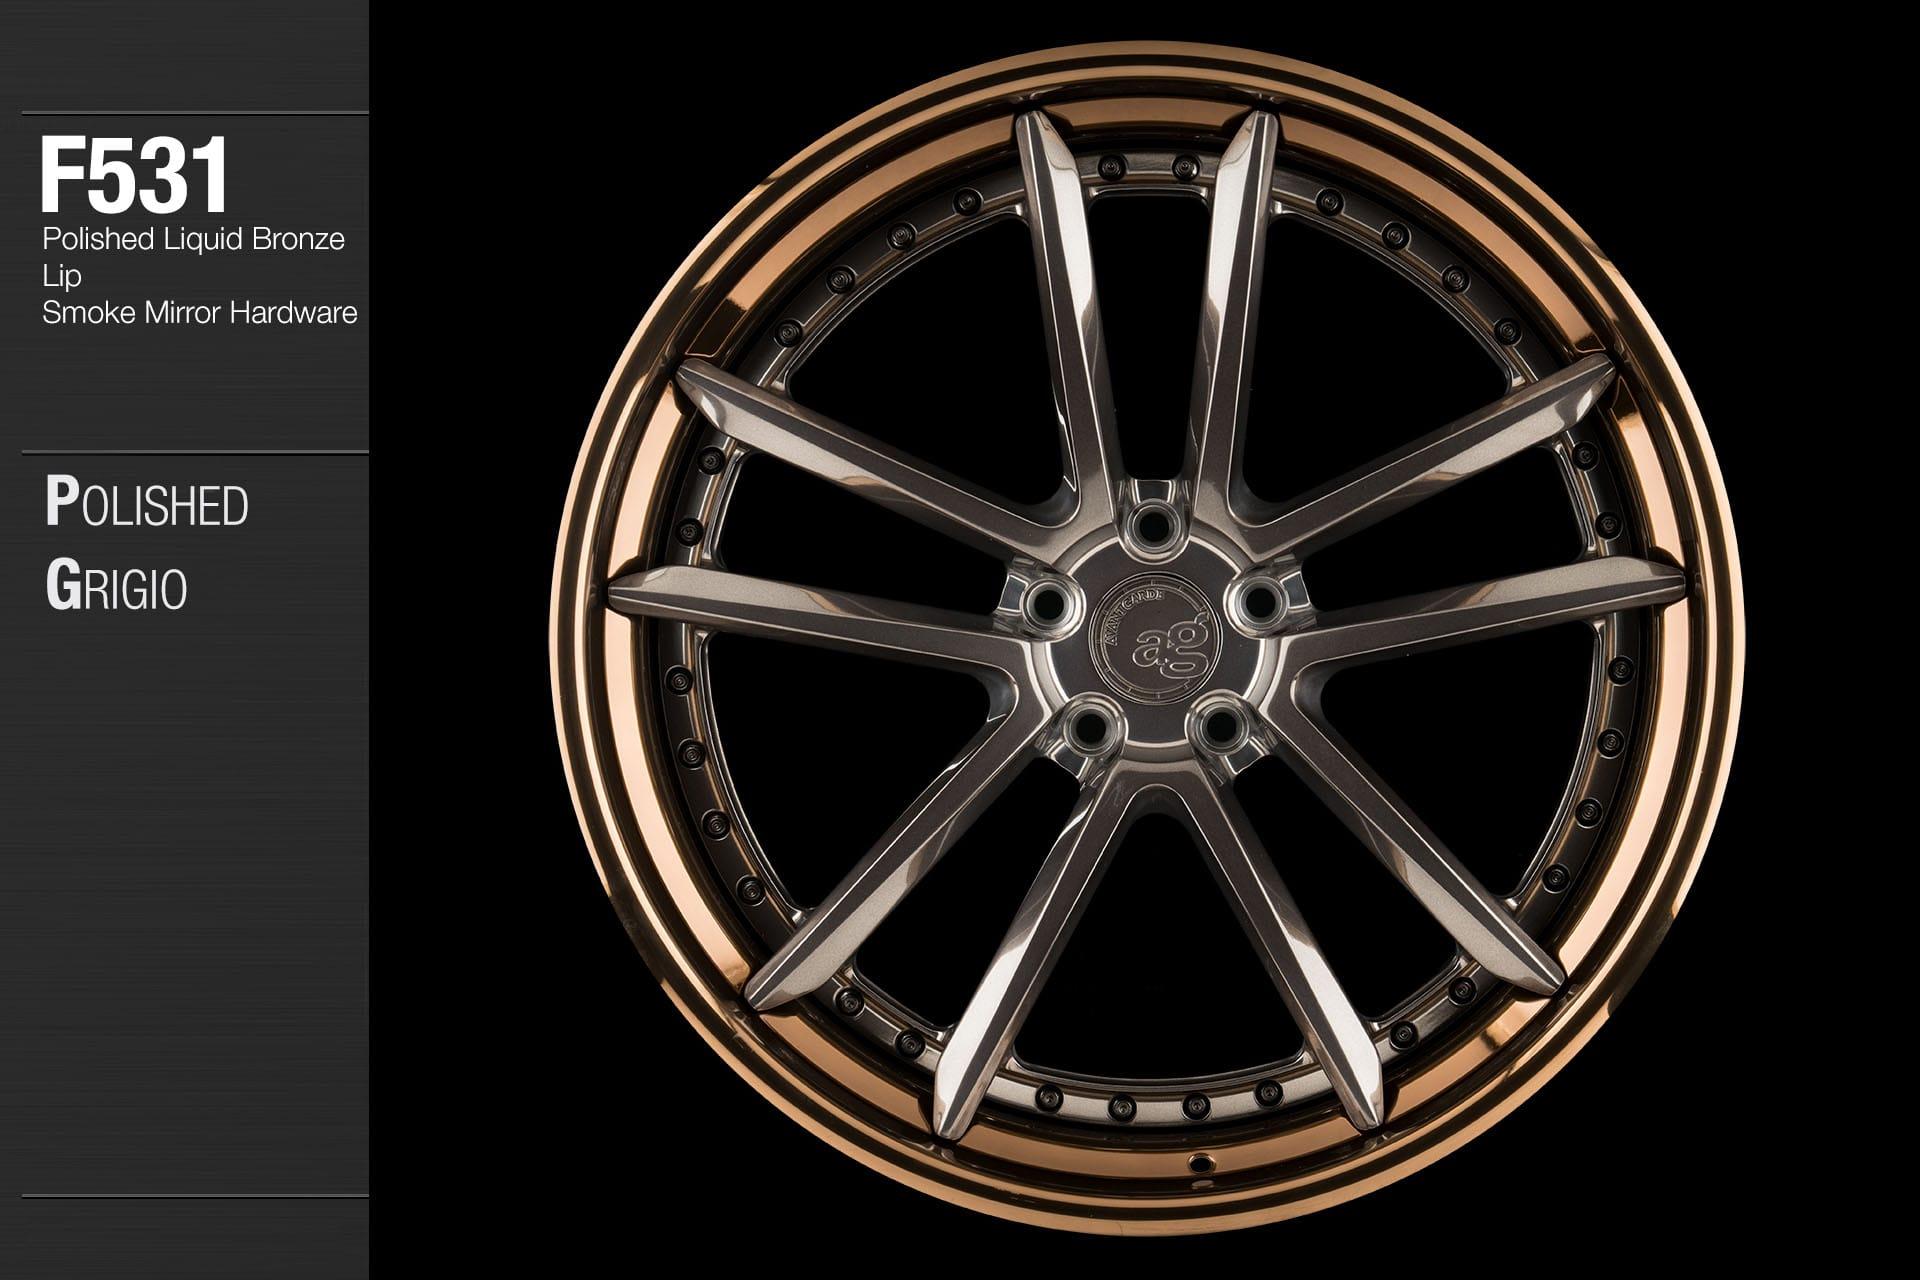 avant-garde-ag-wheels-f531-polished-grigio-face-liquid-bronze-lip-smoke-mirror-hardware-1-min